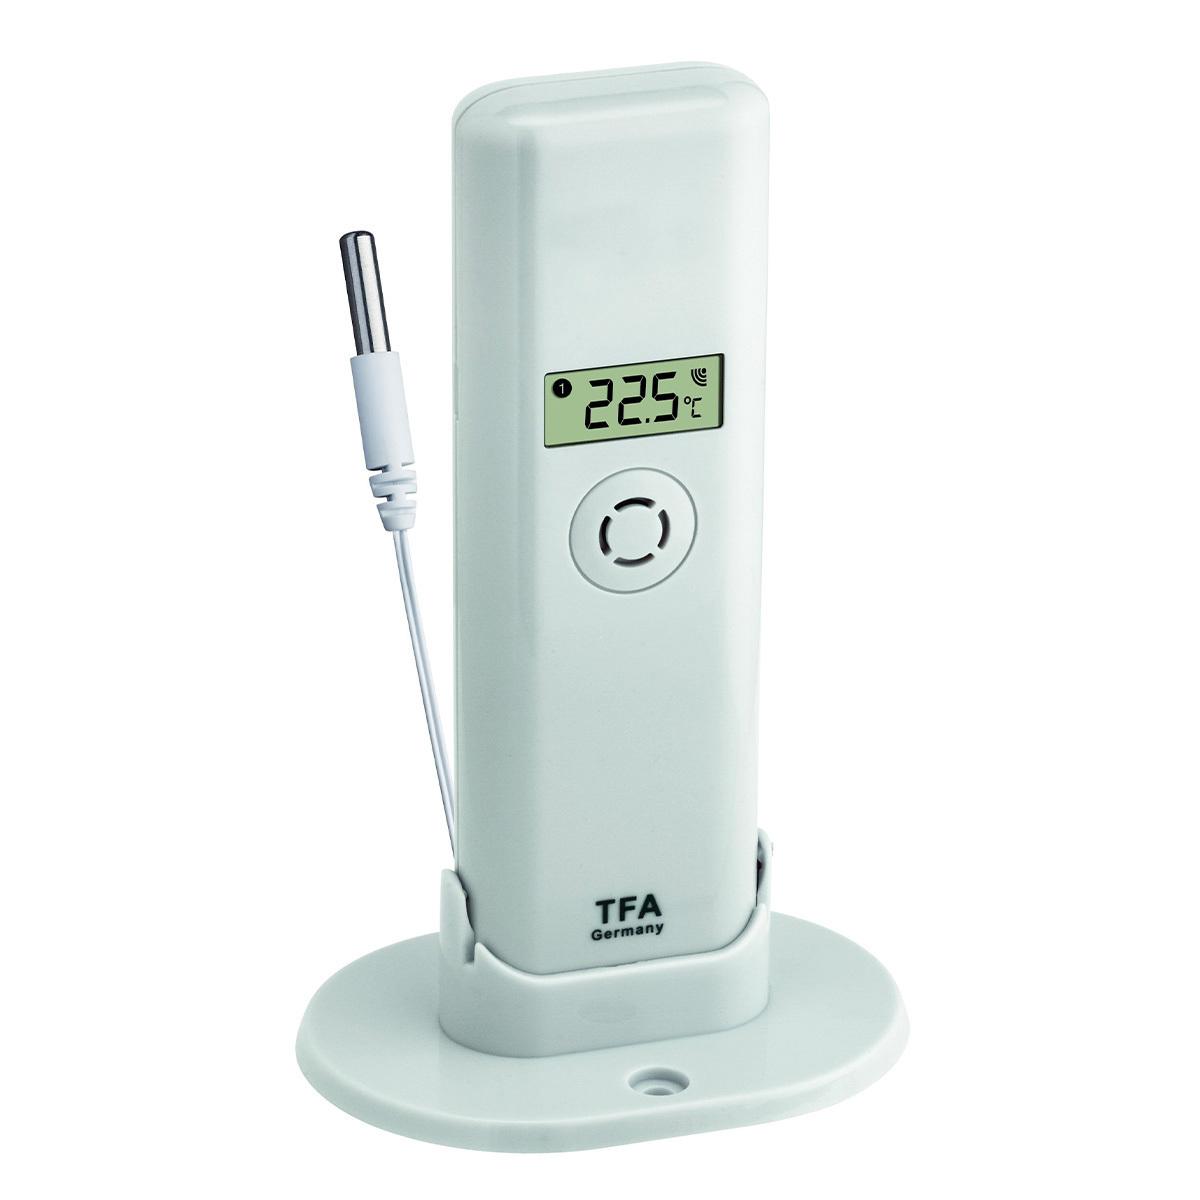 31-4010-02-starter-set-mit-3-temperatursender-weatherhub-observer-sender-1200x1200px.jpg